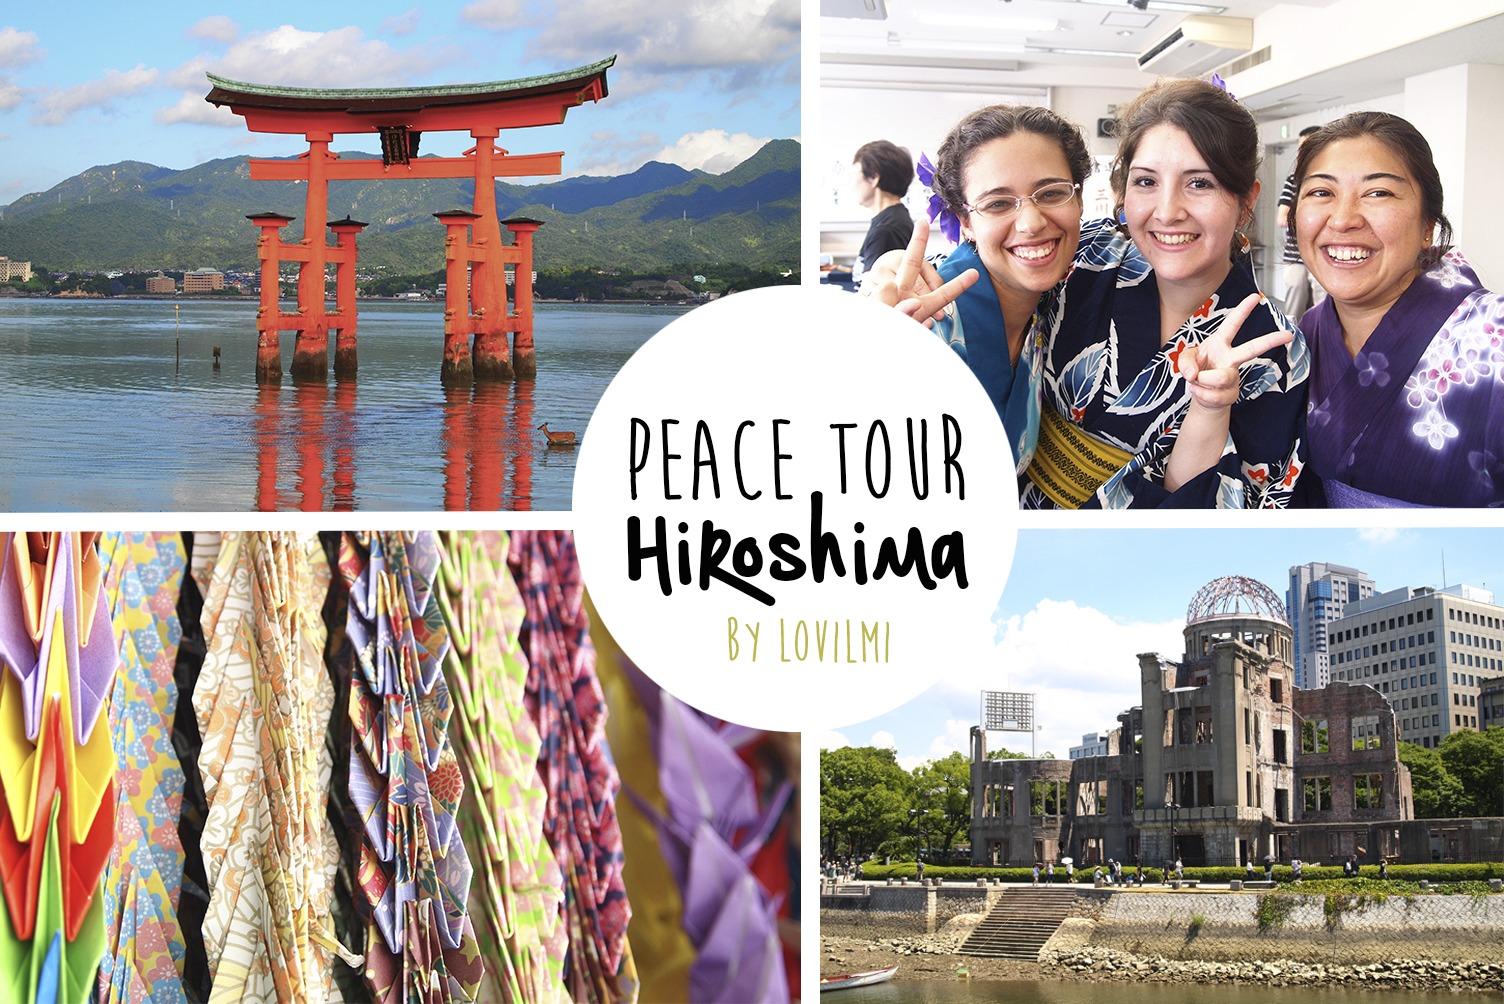 peacetourhiroshimapostbloglovilmi